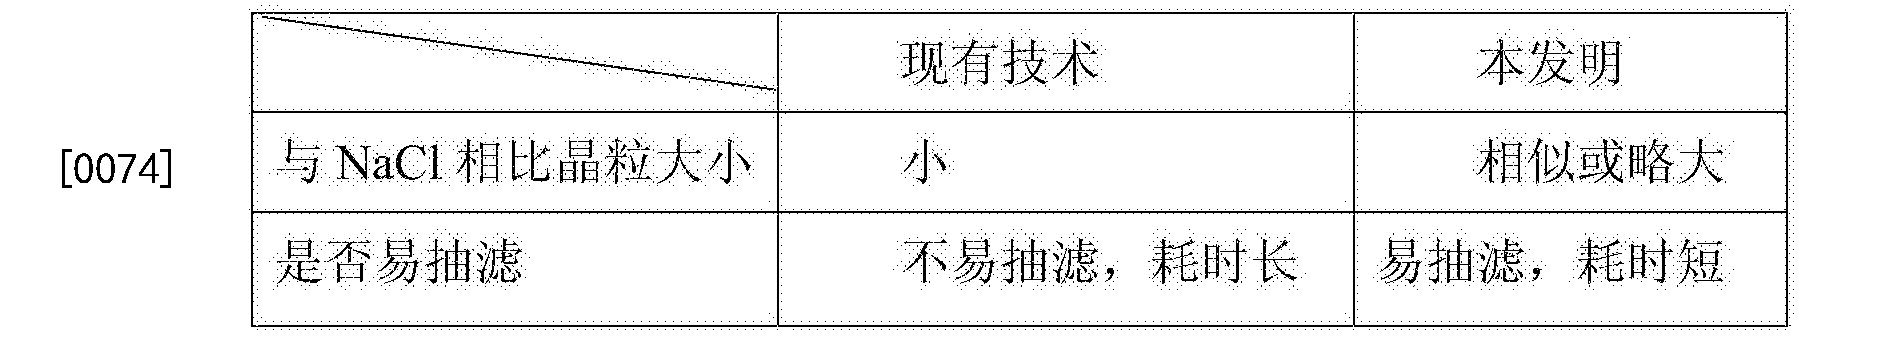 Figure CN106866669AD00102